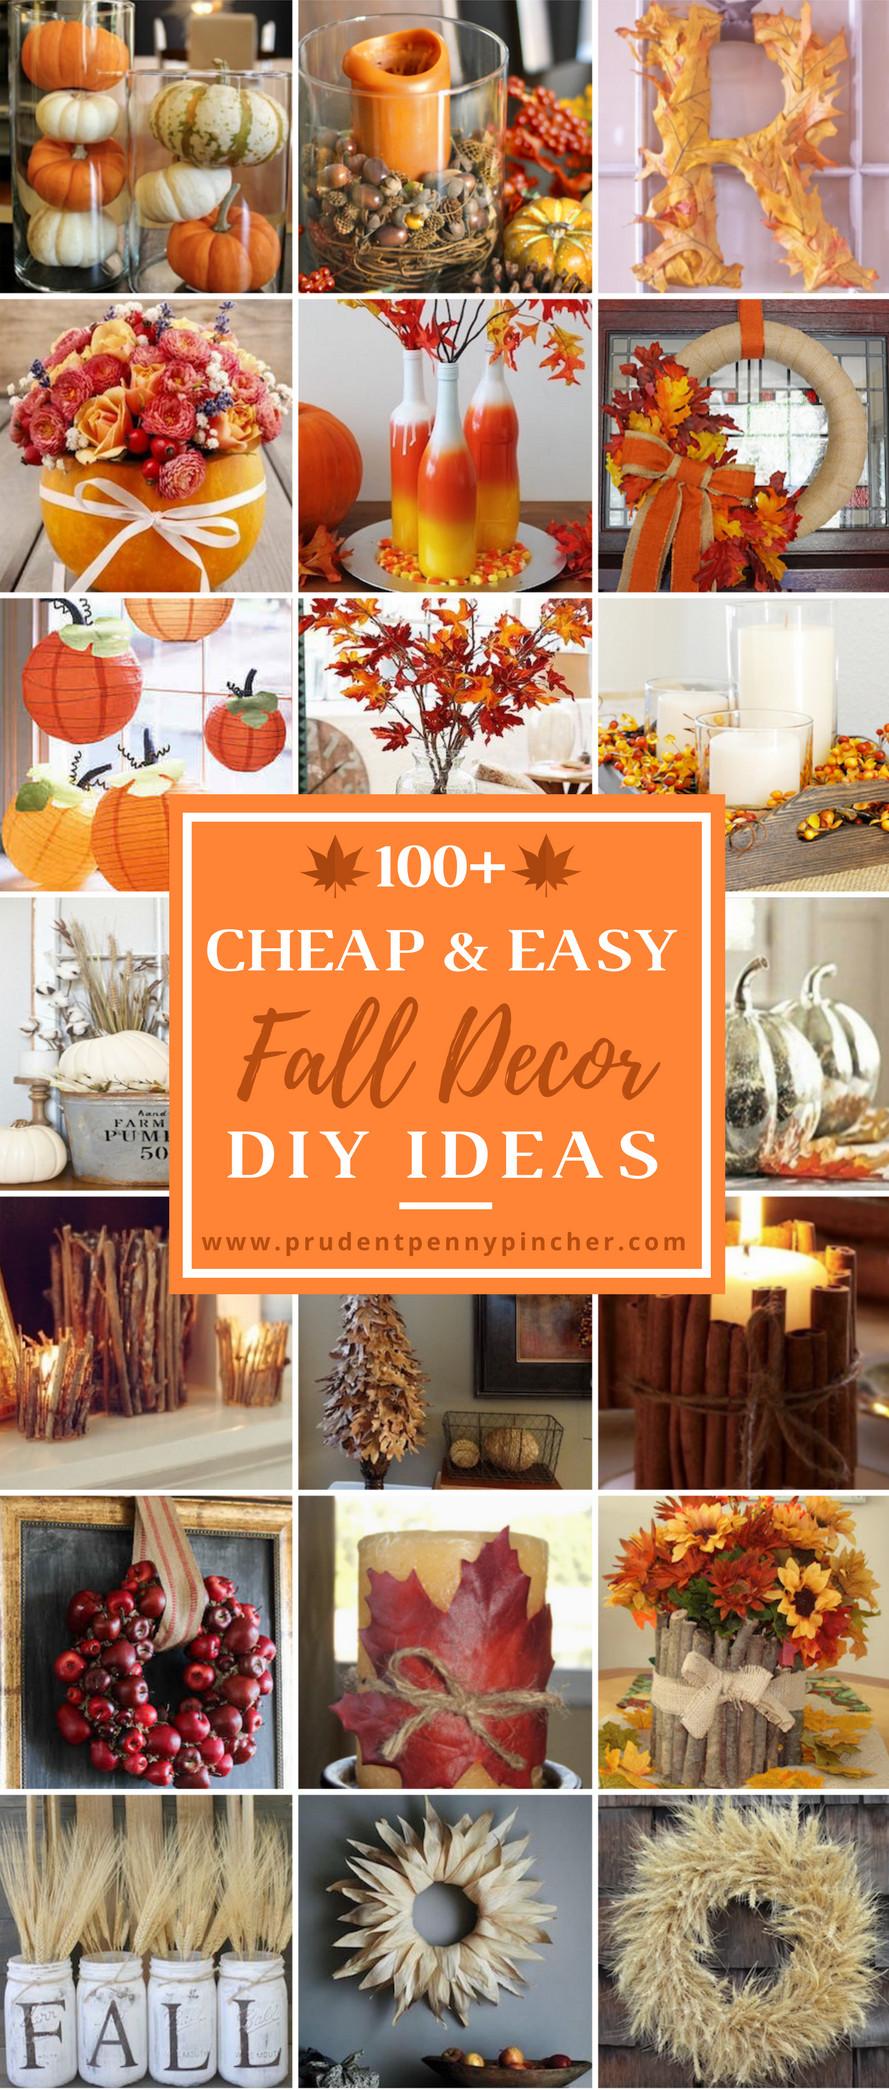 Fall Decorating Ideas DIY  100 Cheap and Easy Fall Decor DIY Ideas Prudent Penny